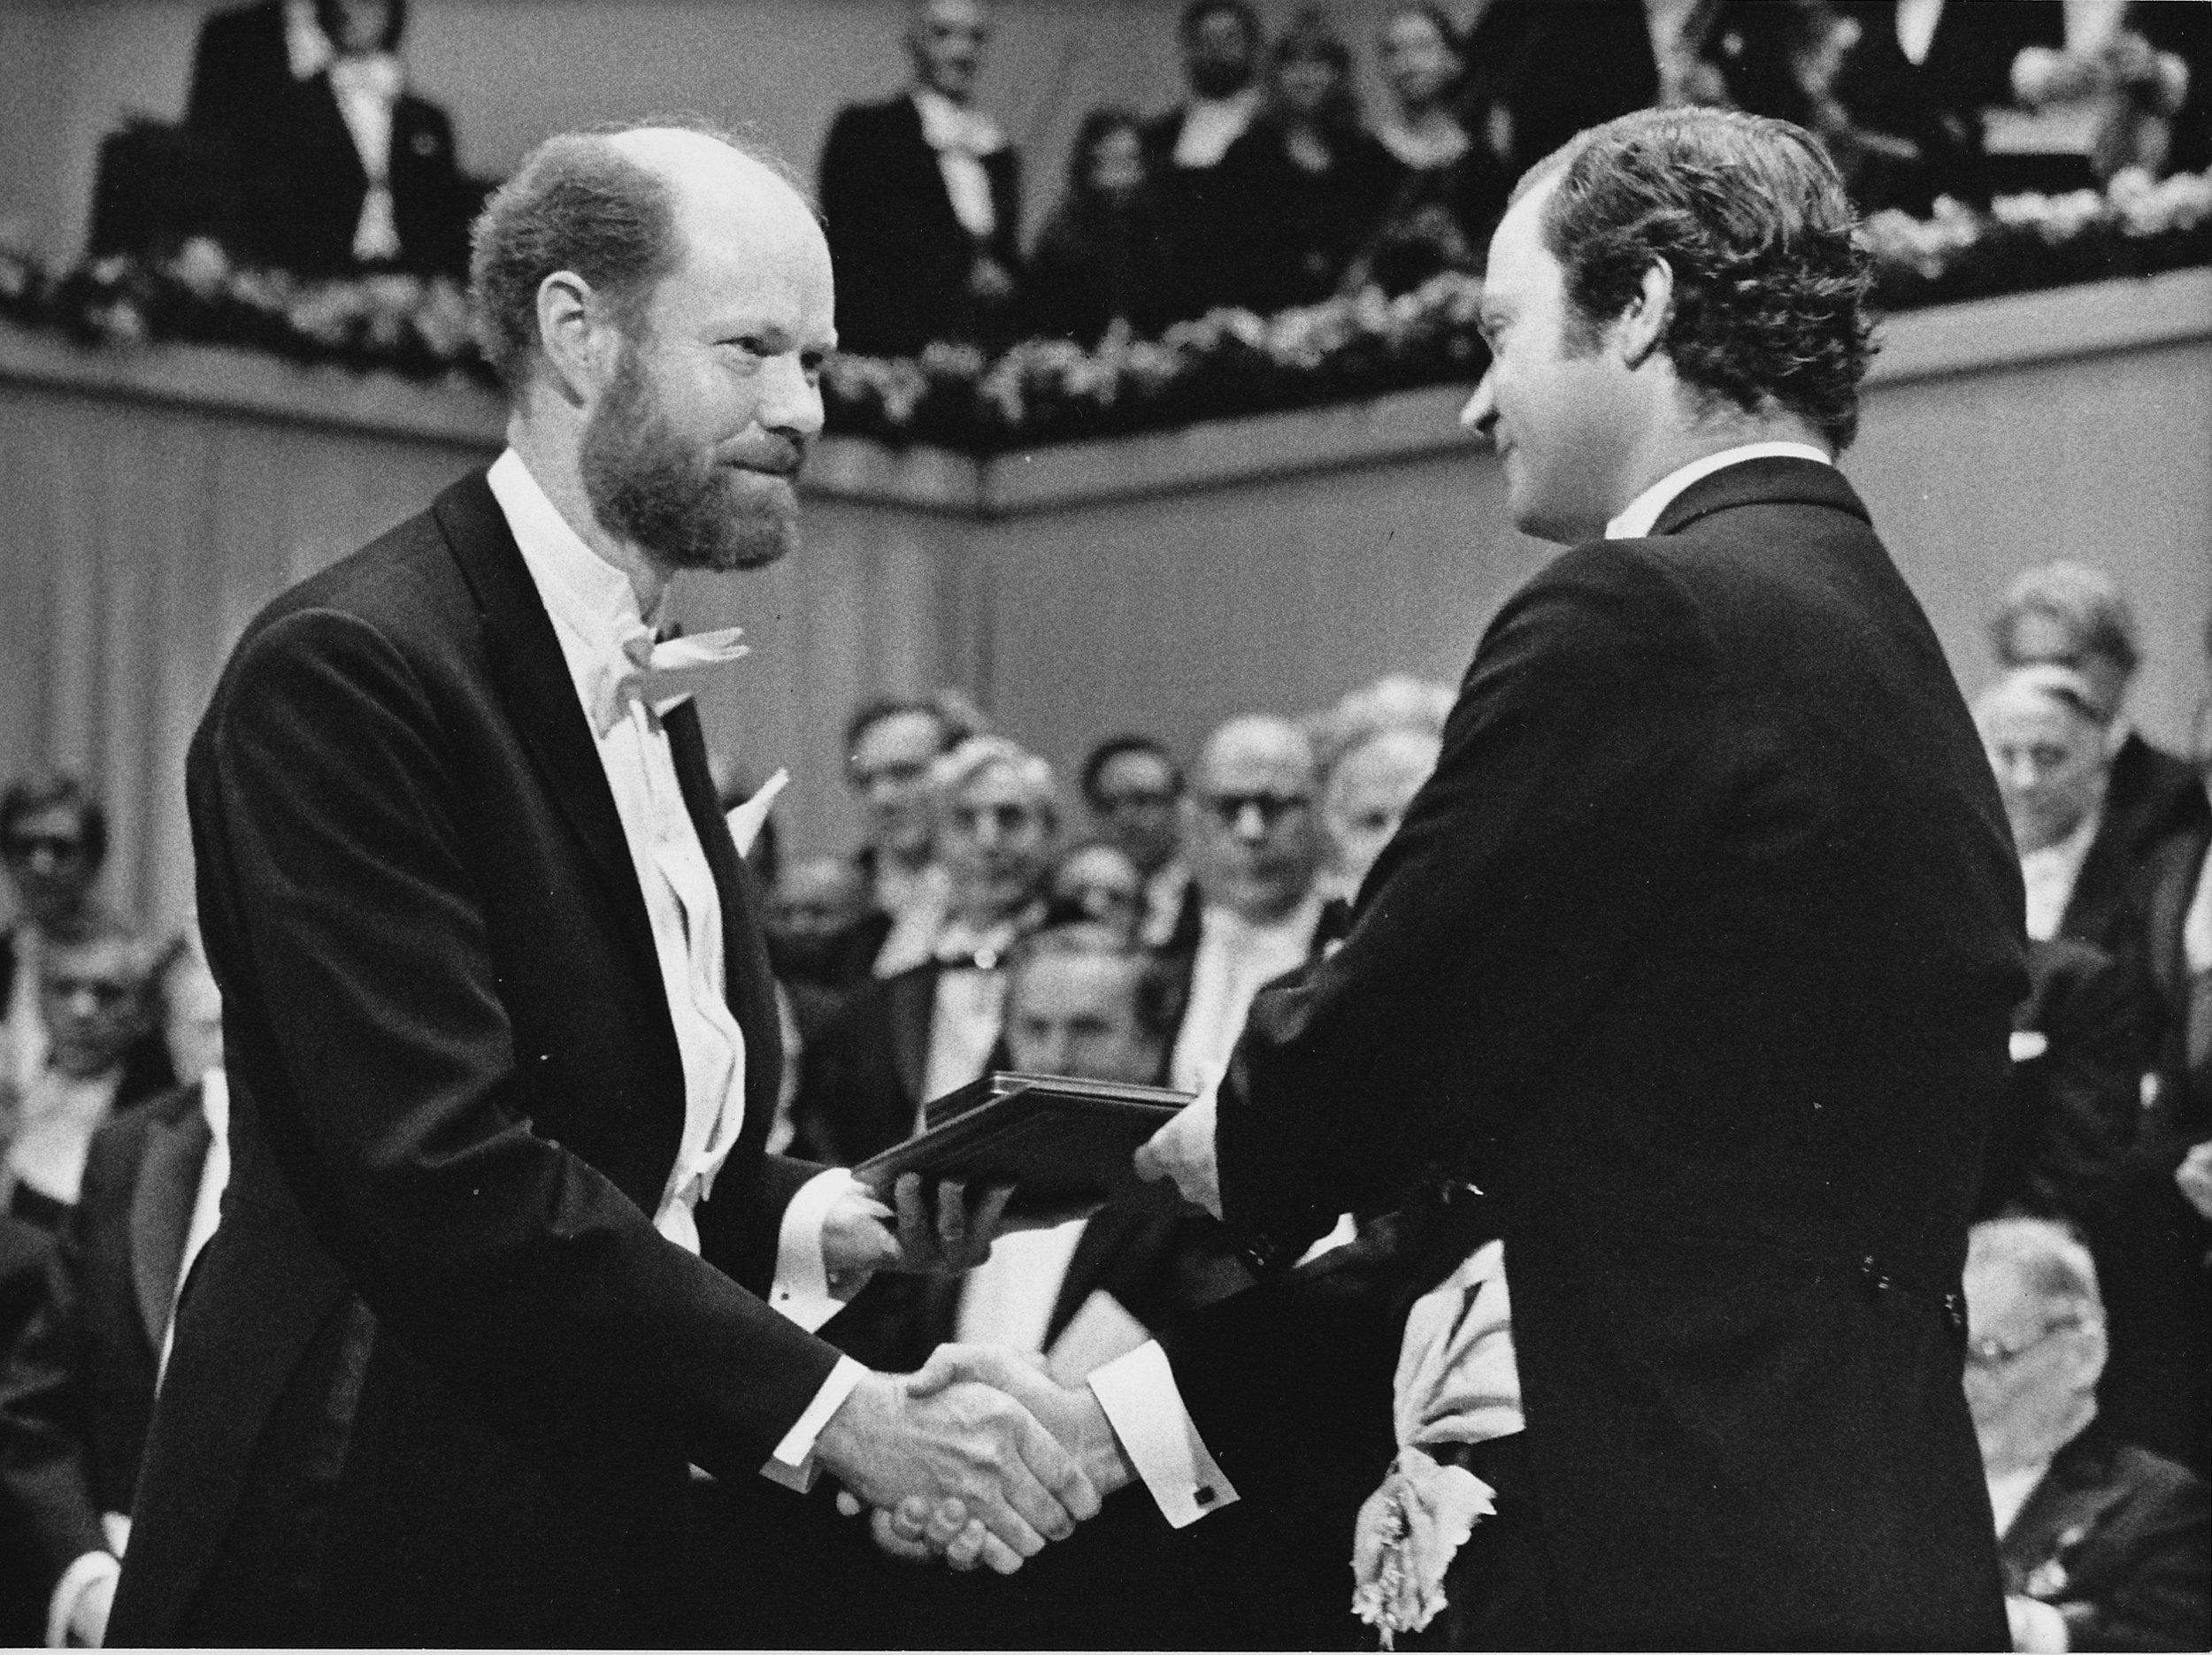 Bob King Carl Gustav Collecting his Nobel Prize